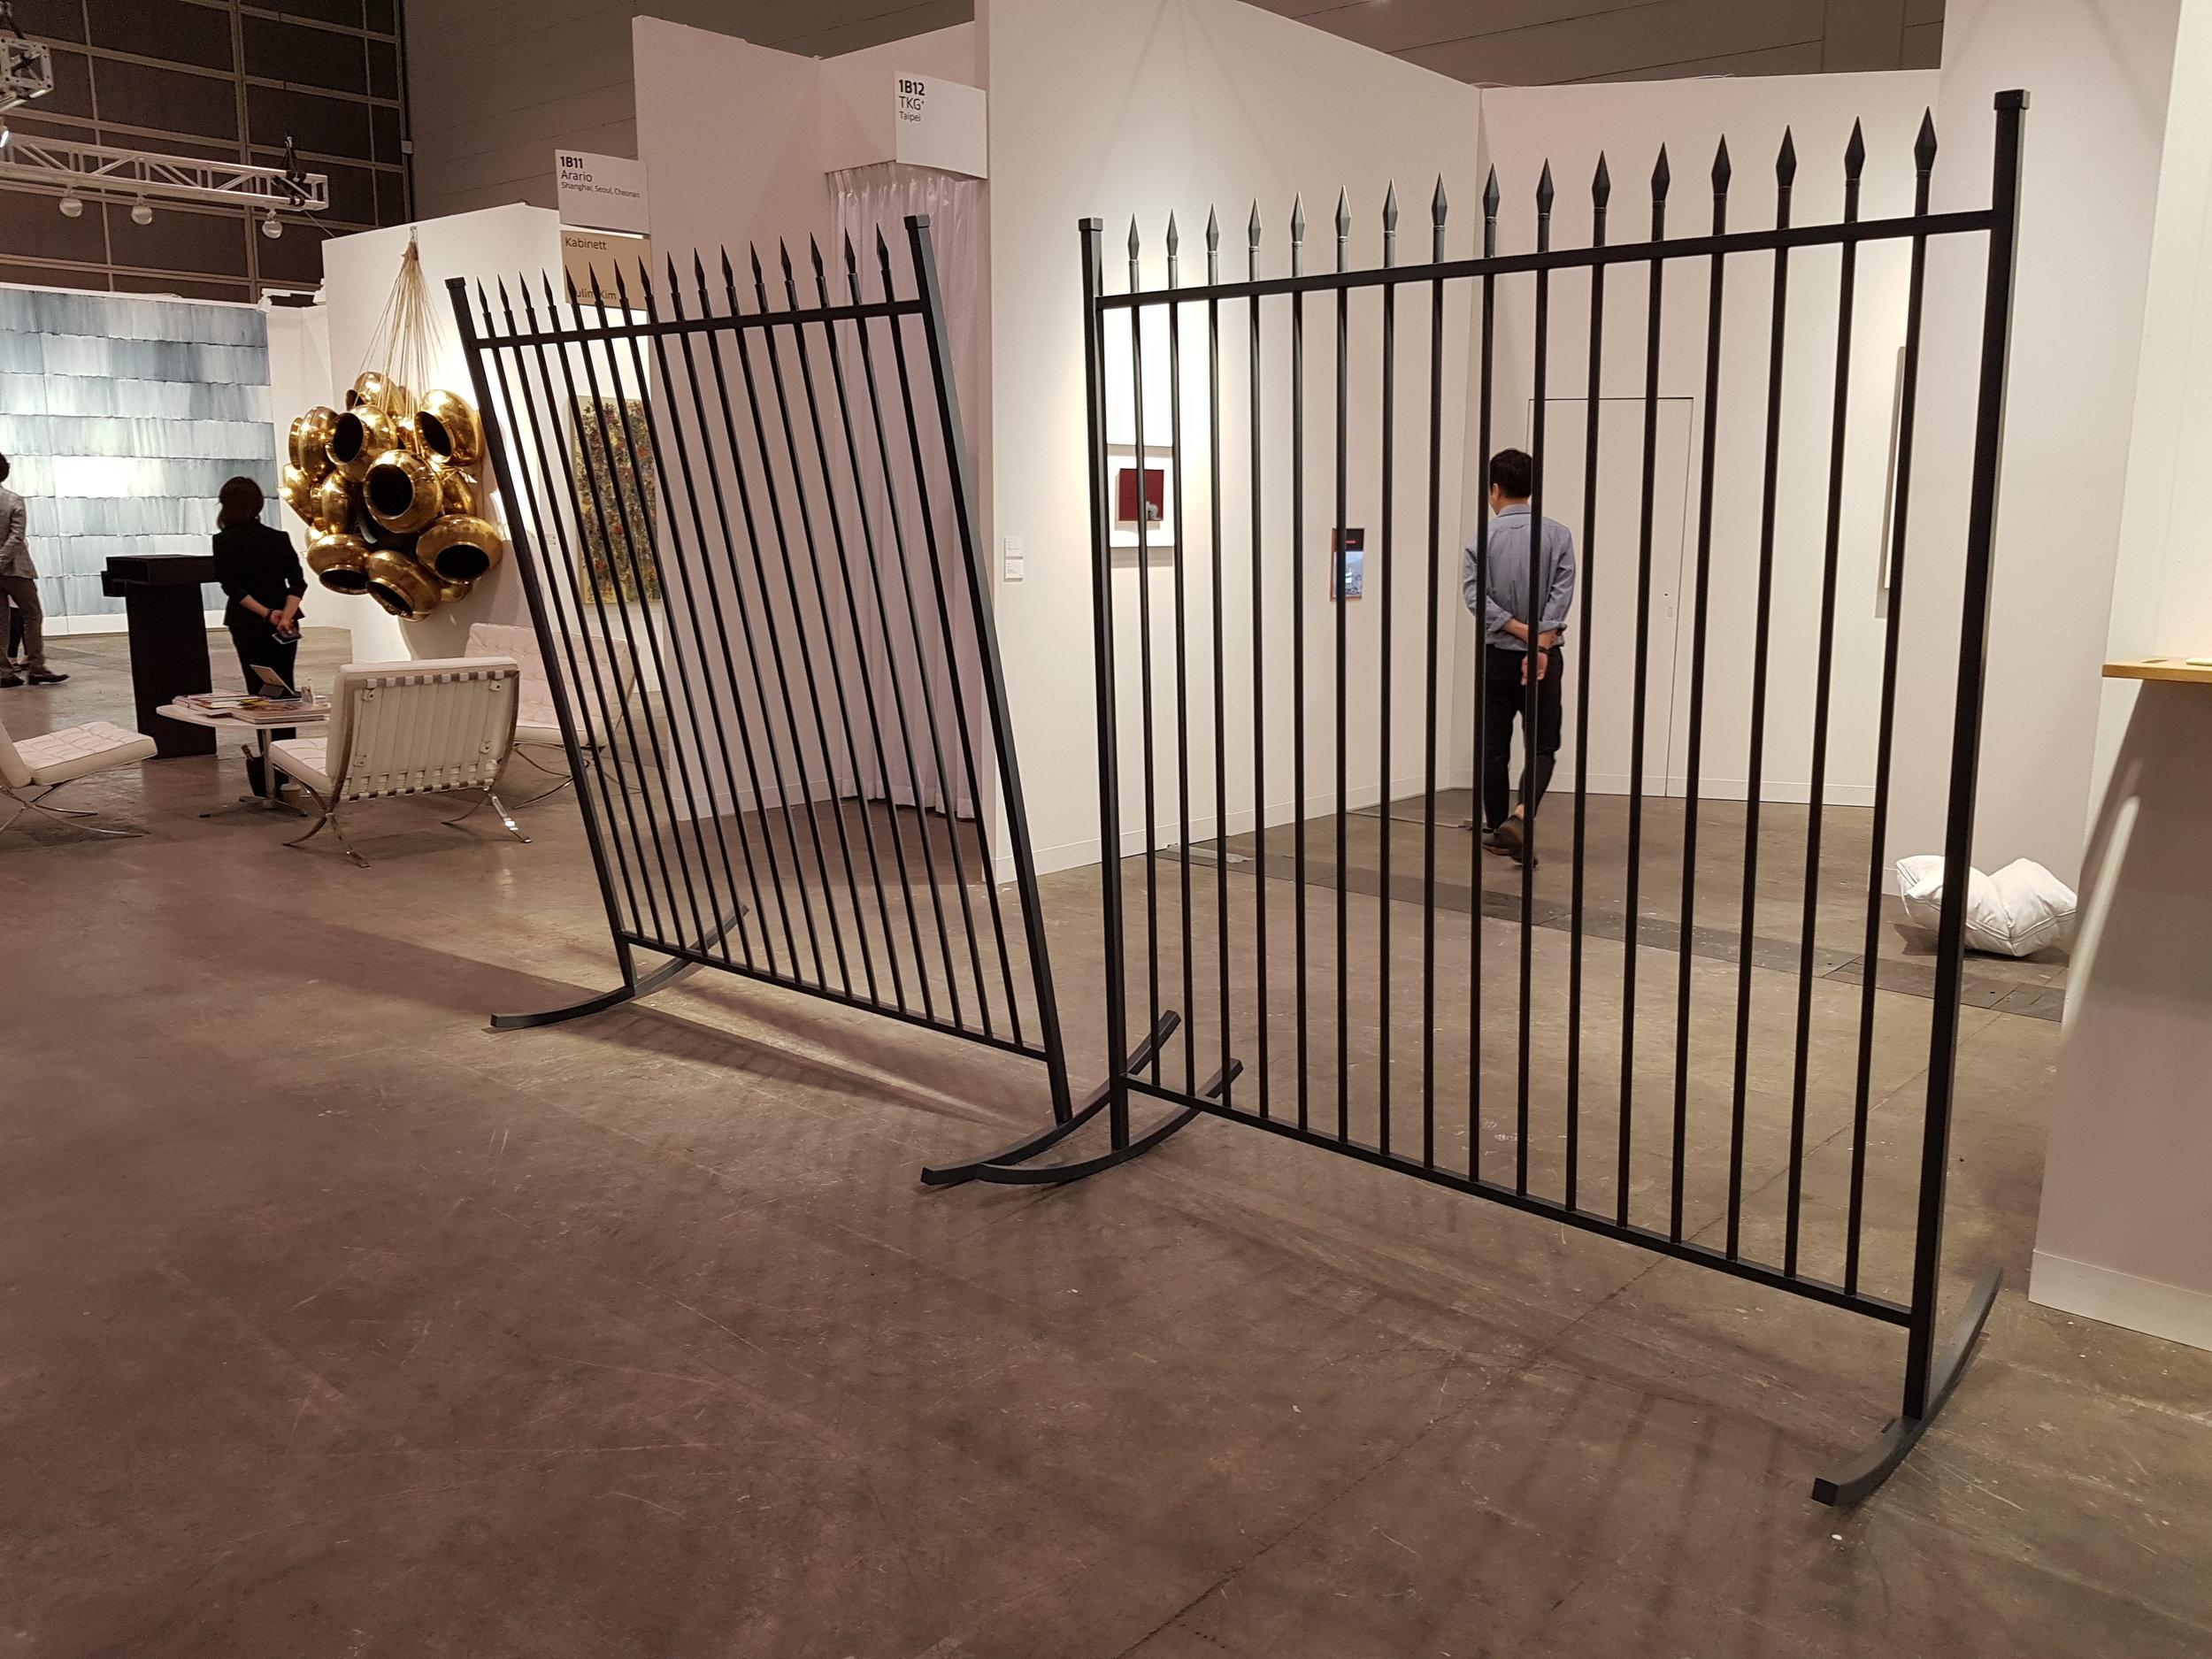 Joyce Ho,  Balancing Act , 2018, installation view, TKG+ booth, Art Basel Hong Kong, March 2018; photo: Chloé Wolifson